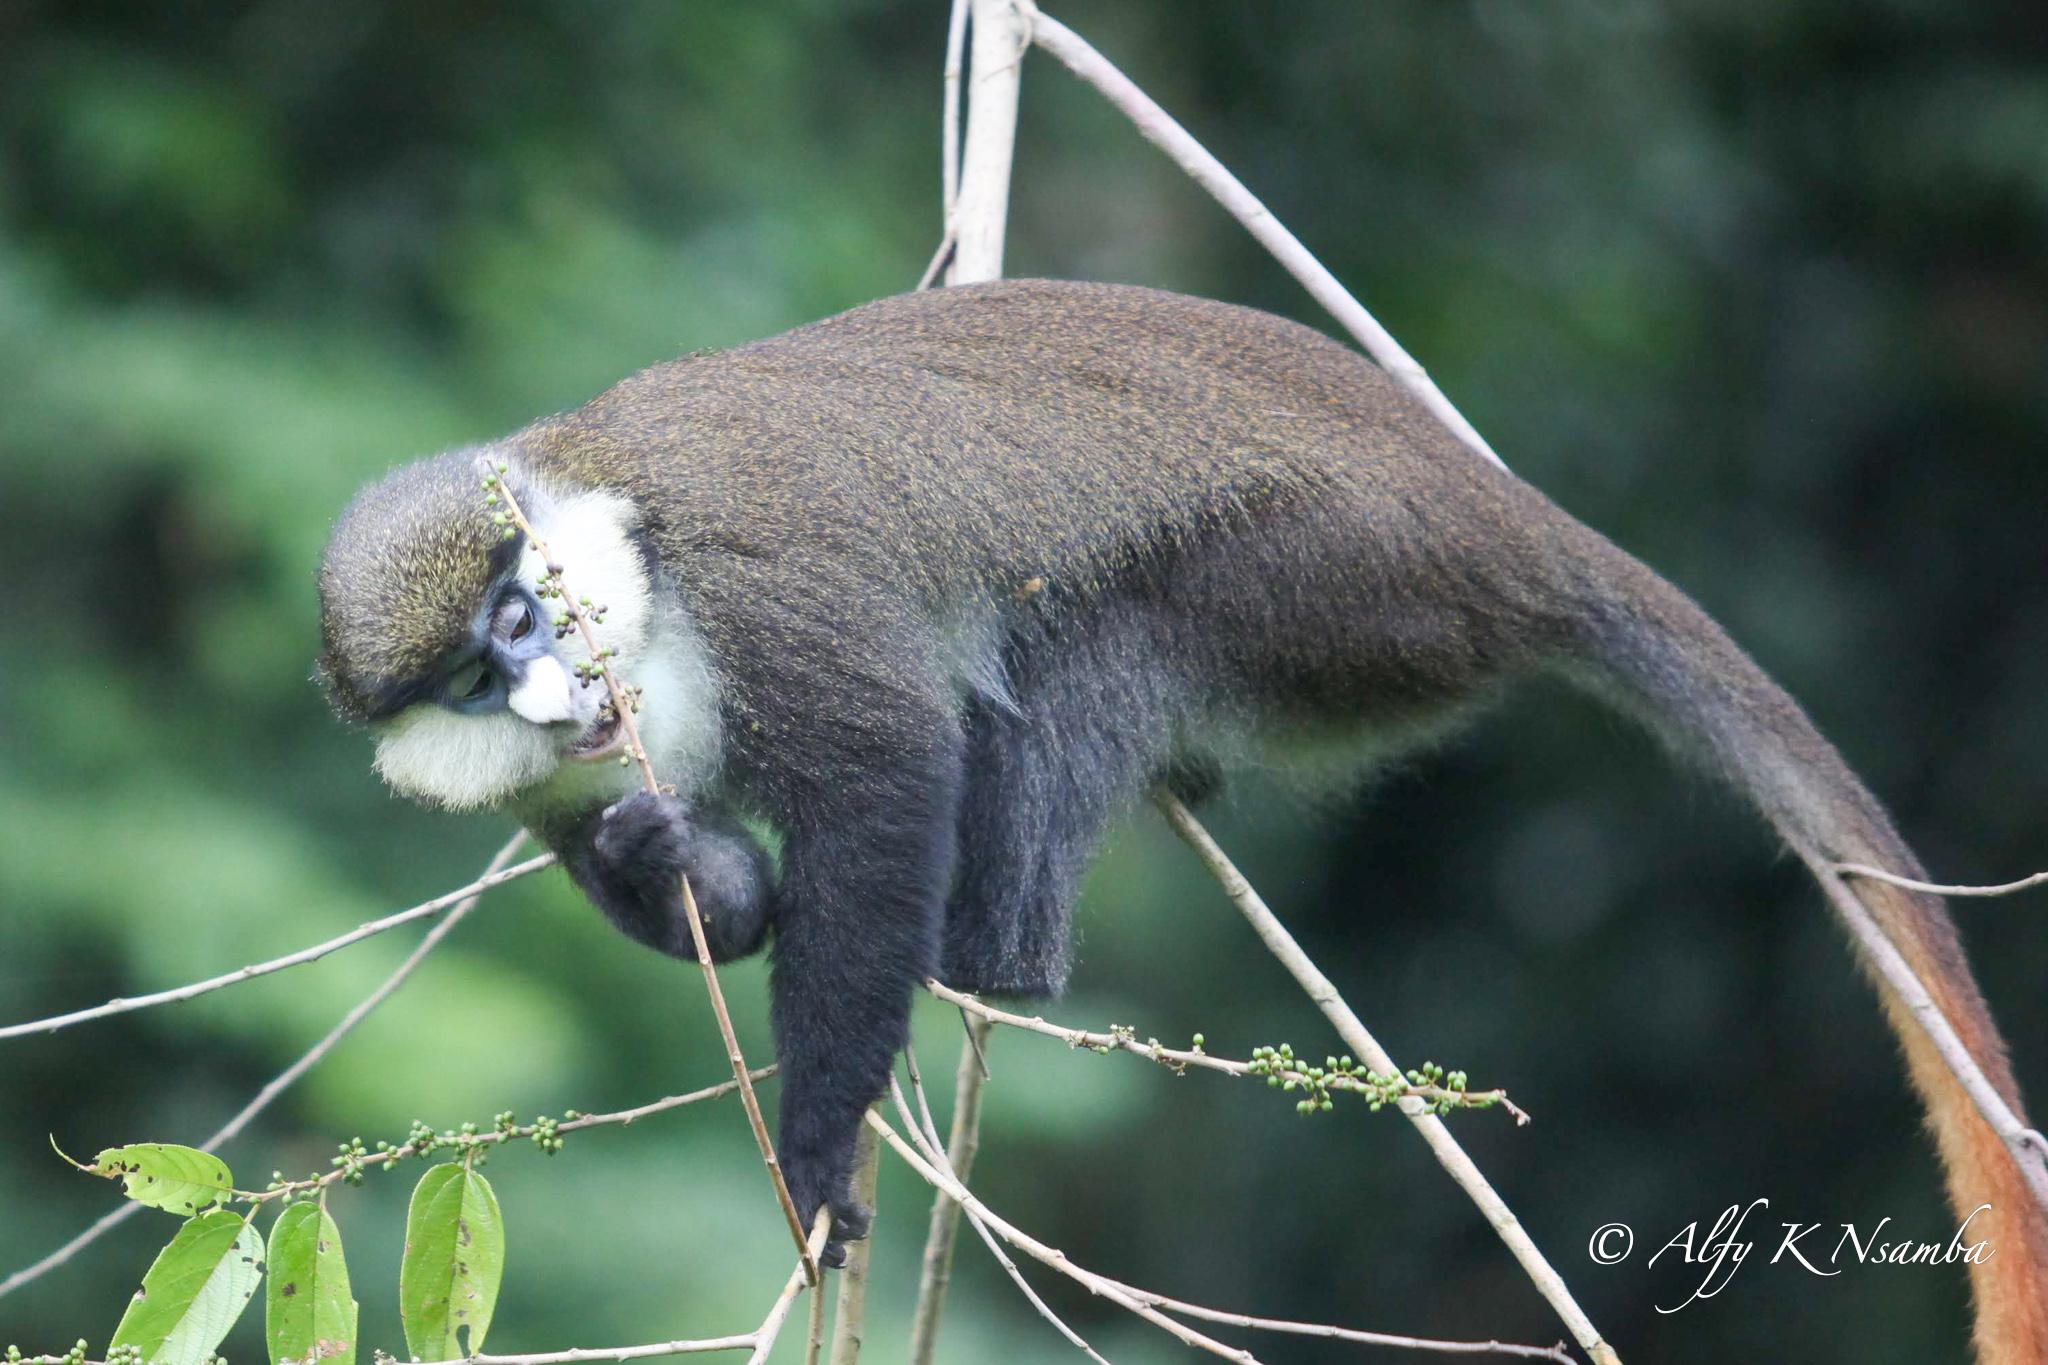 Uganda Red Tailed Monkey Kibale 2